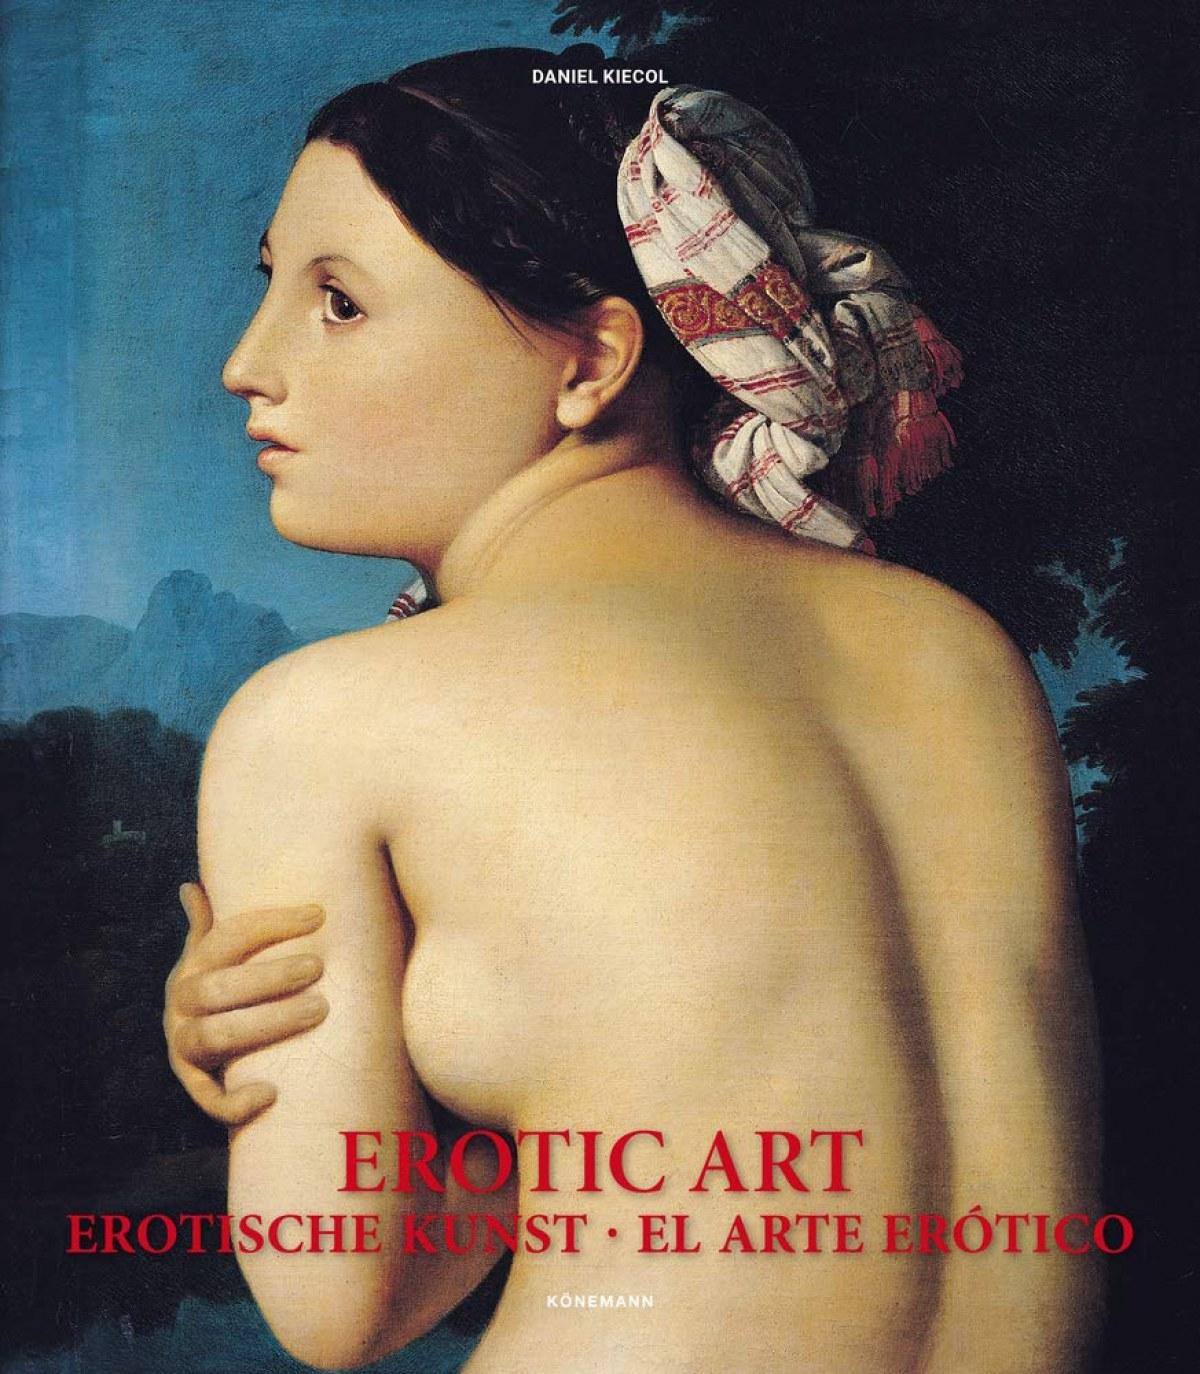 EROTIC ART 9783741918209